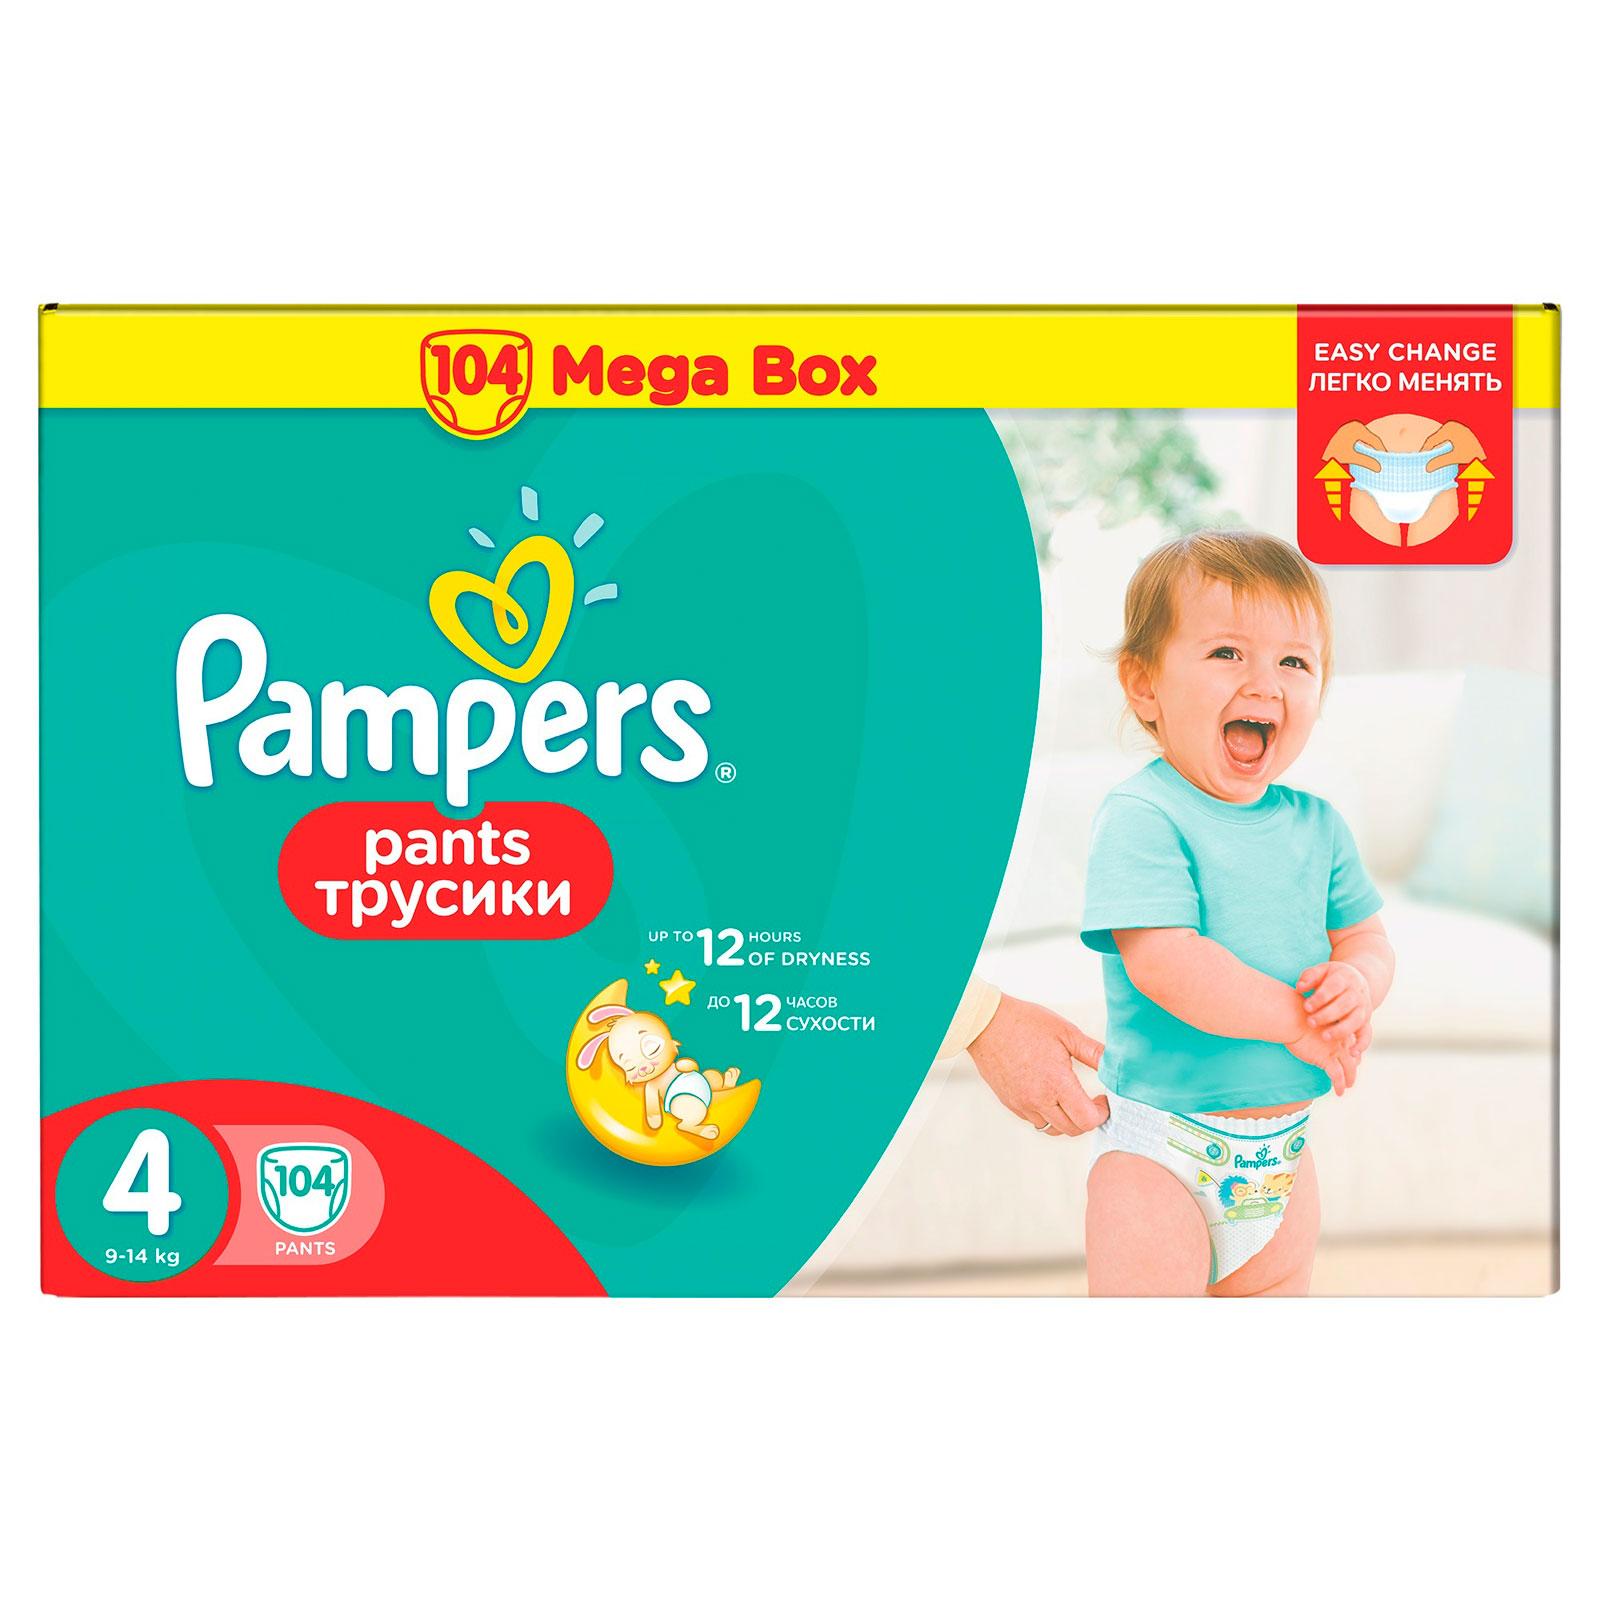 Трусики Pampers Pants Maxi 9-14 кг (104 шт) Размер 4<br>